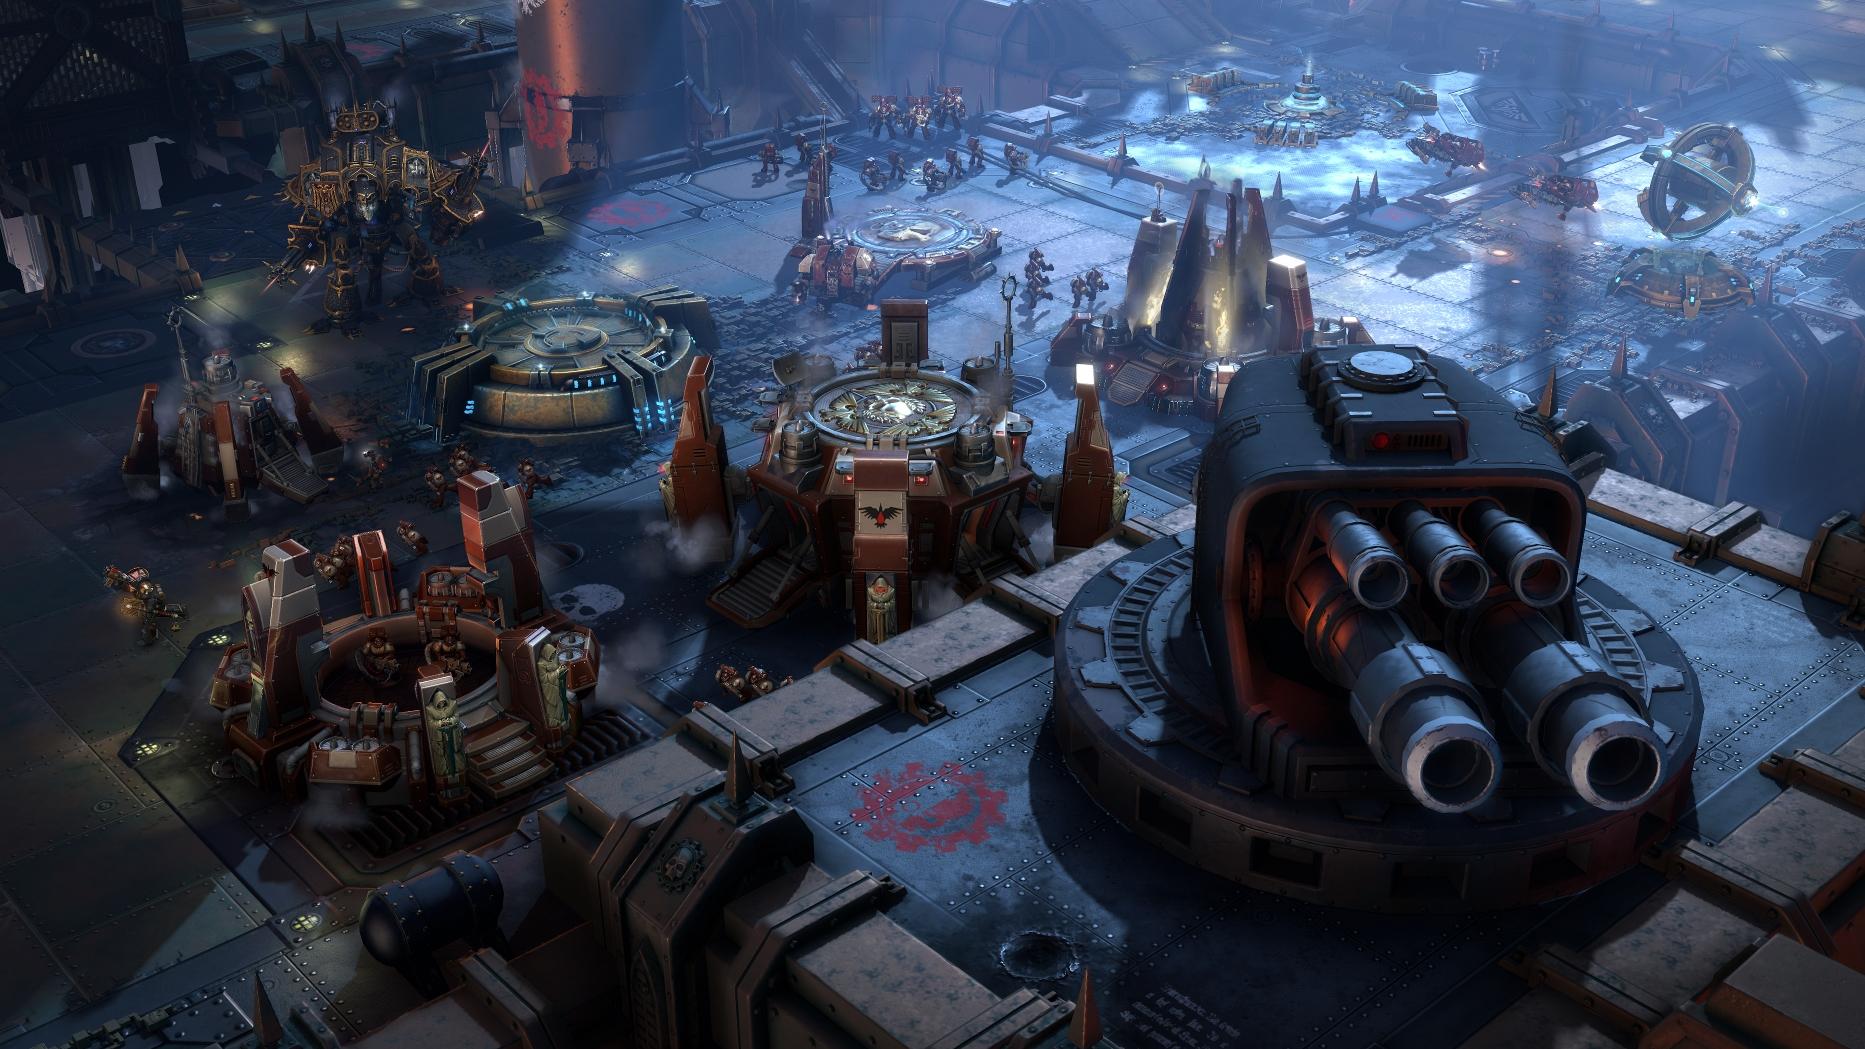 Warhammer 40,000: Dawn Of War III (PC) - Space Marines do love their big guns